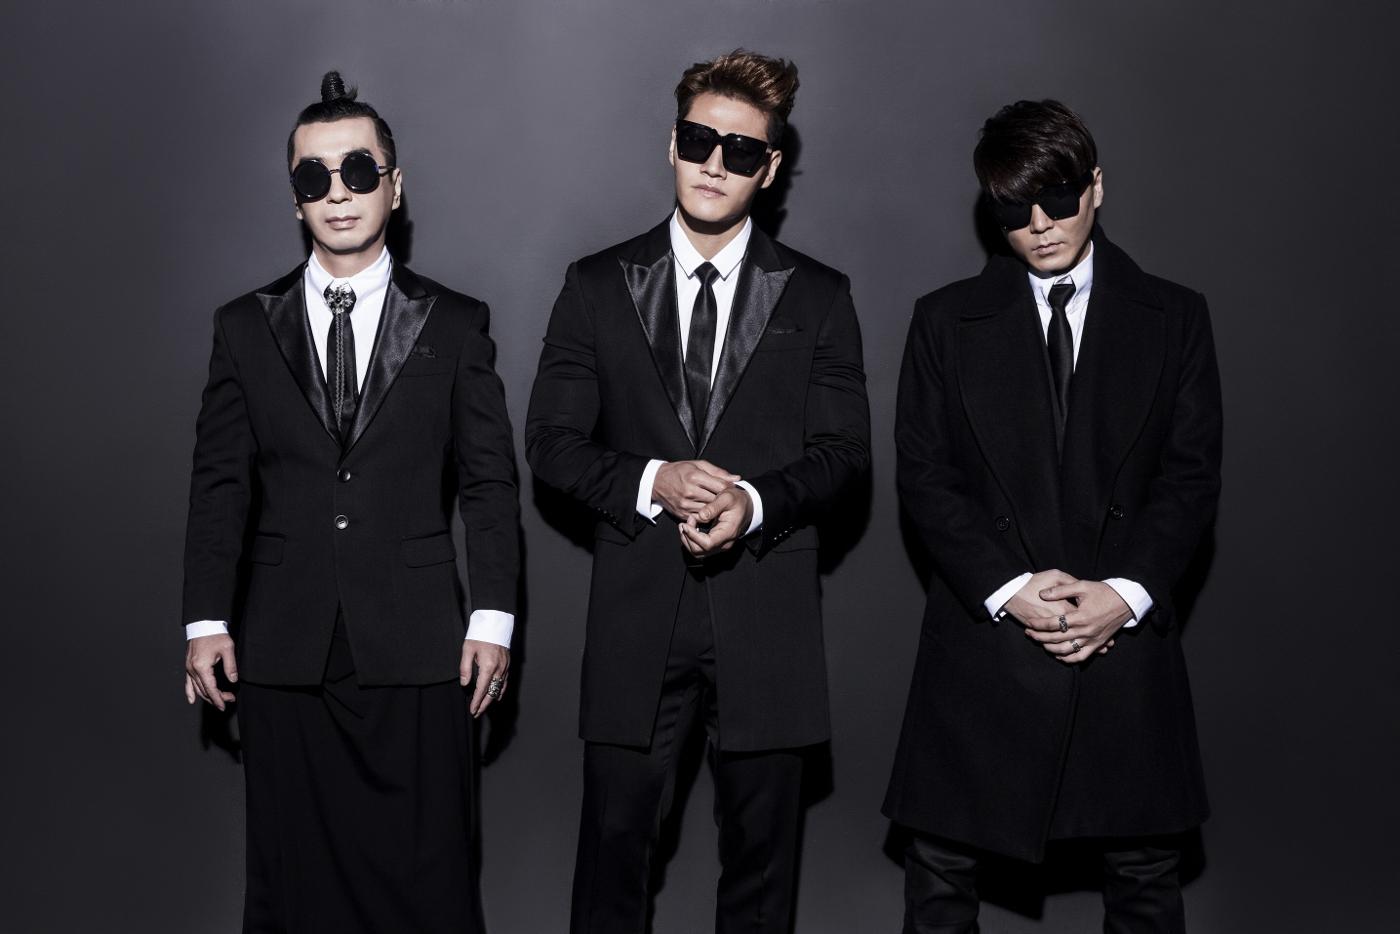 Turbo's Kim Jung Nam Expresses Regret at the Group's Initial Disbandment